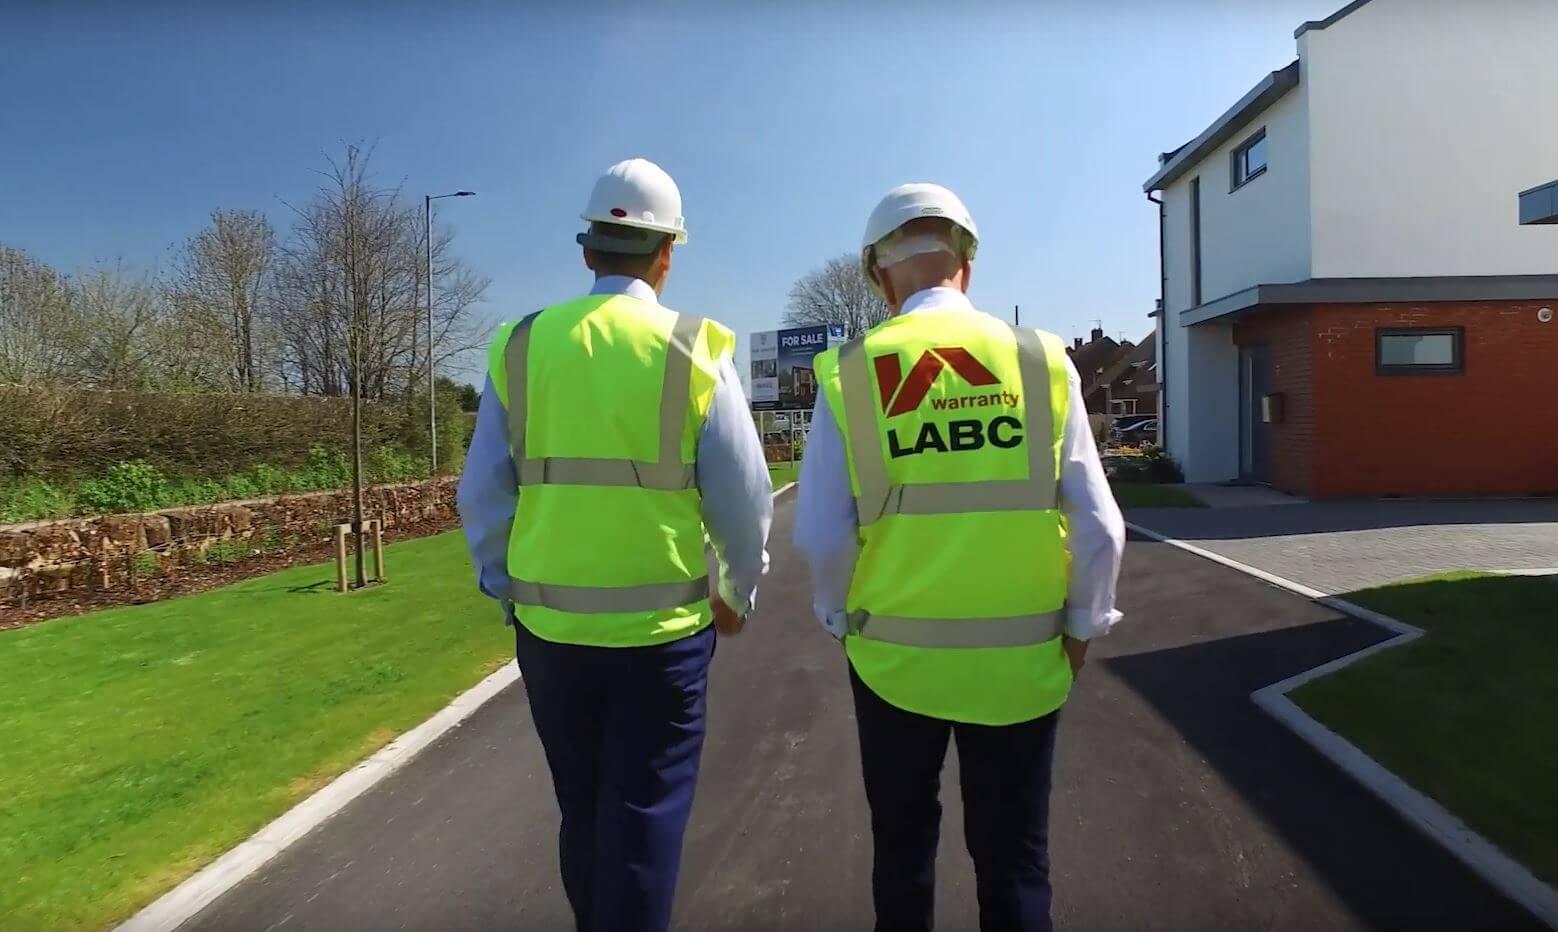 LABC Warranty inspections 2